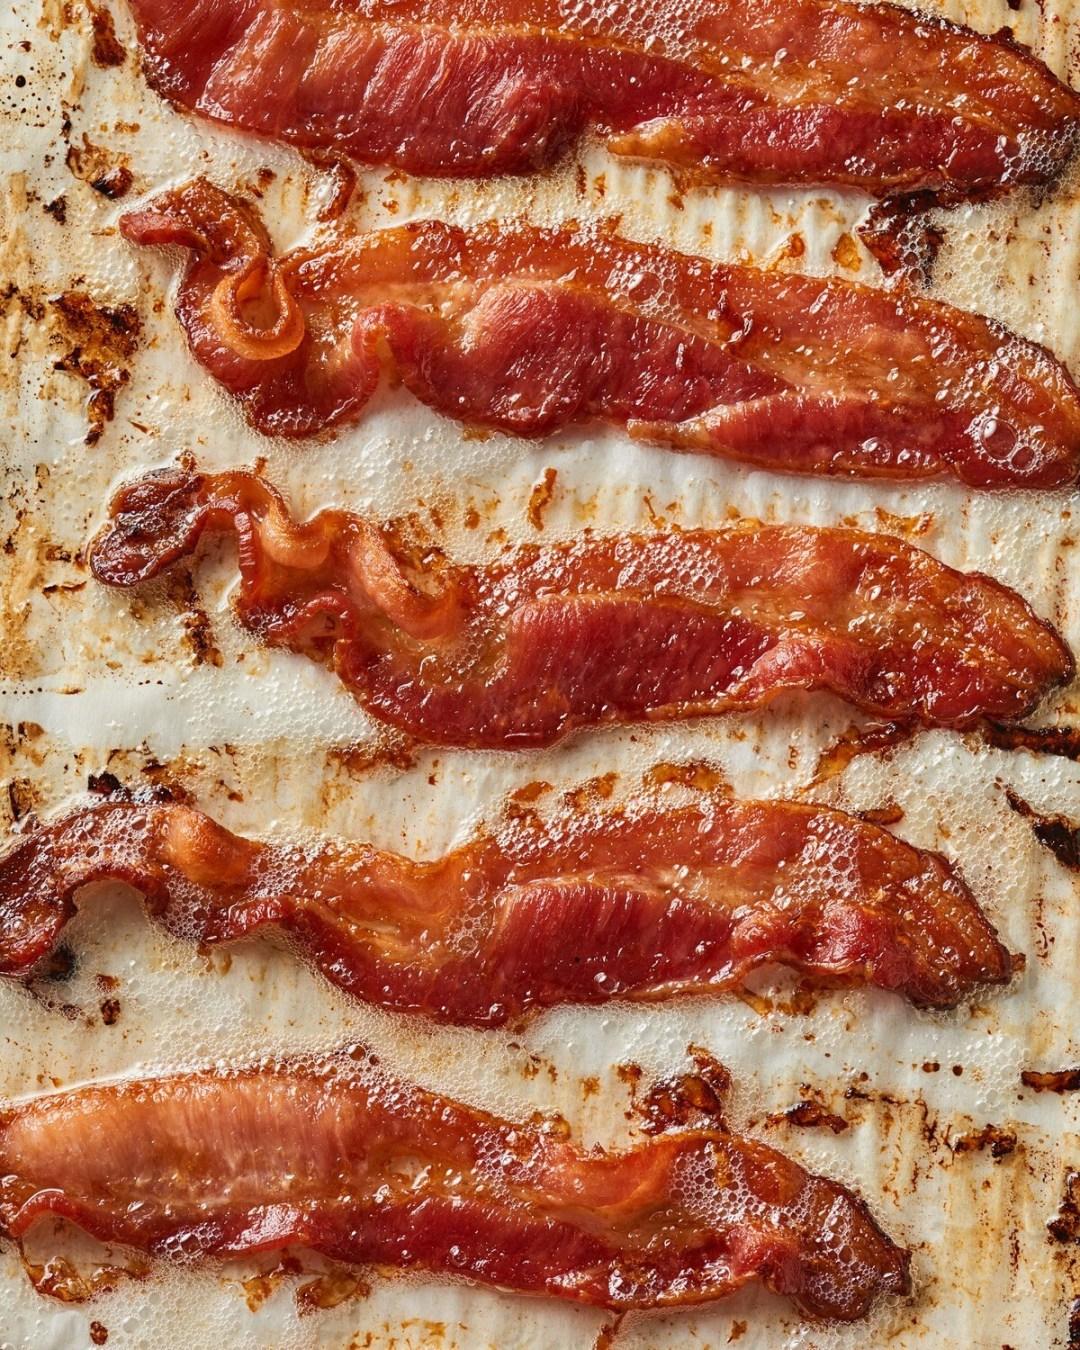 SGF Uncured Maple Pork Bacon